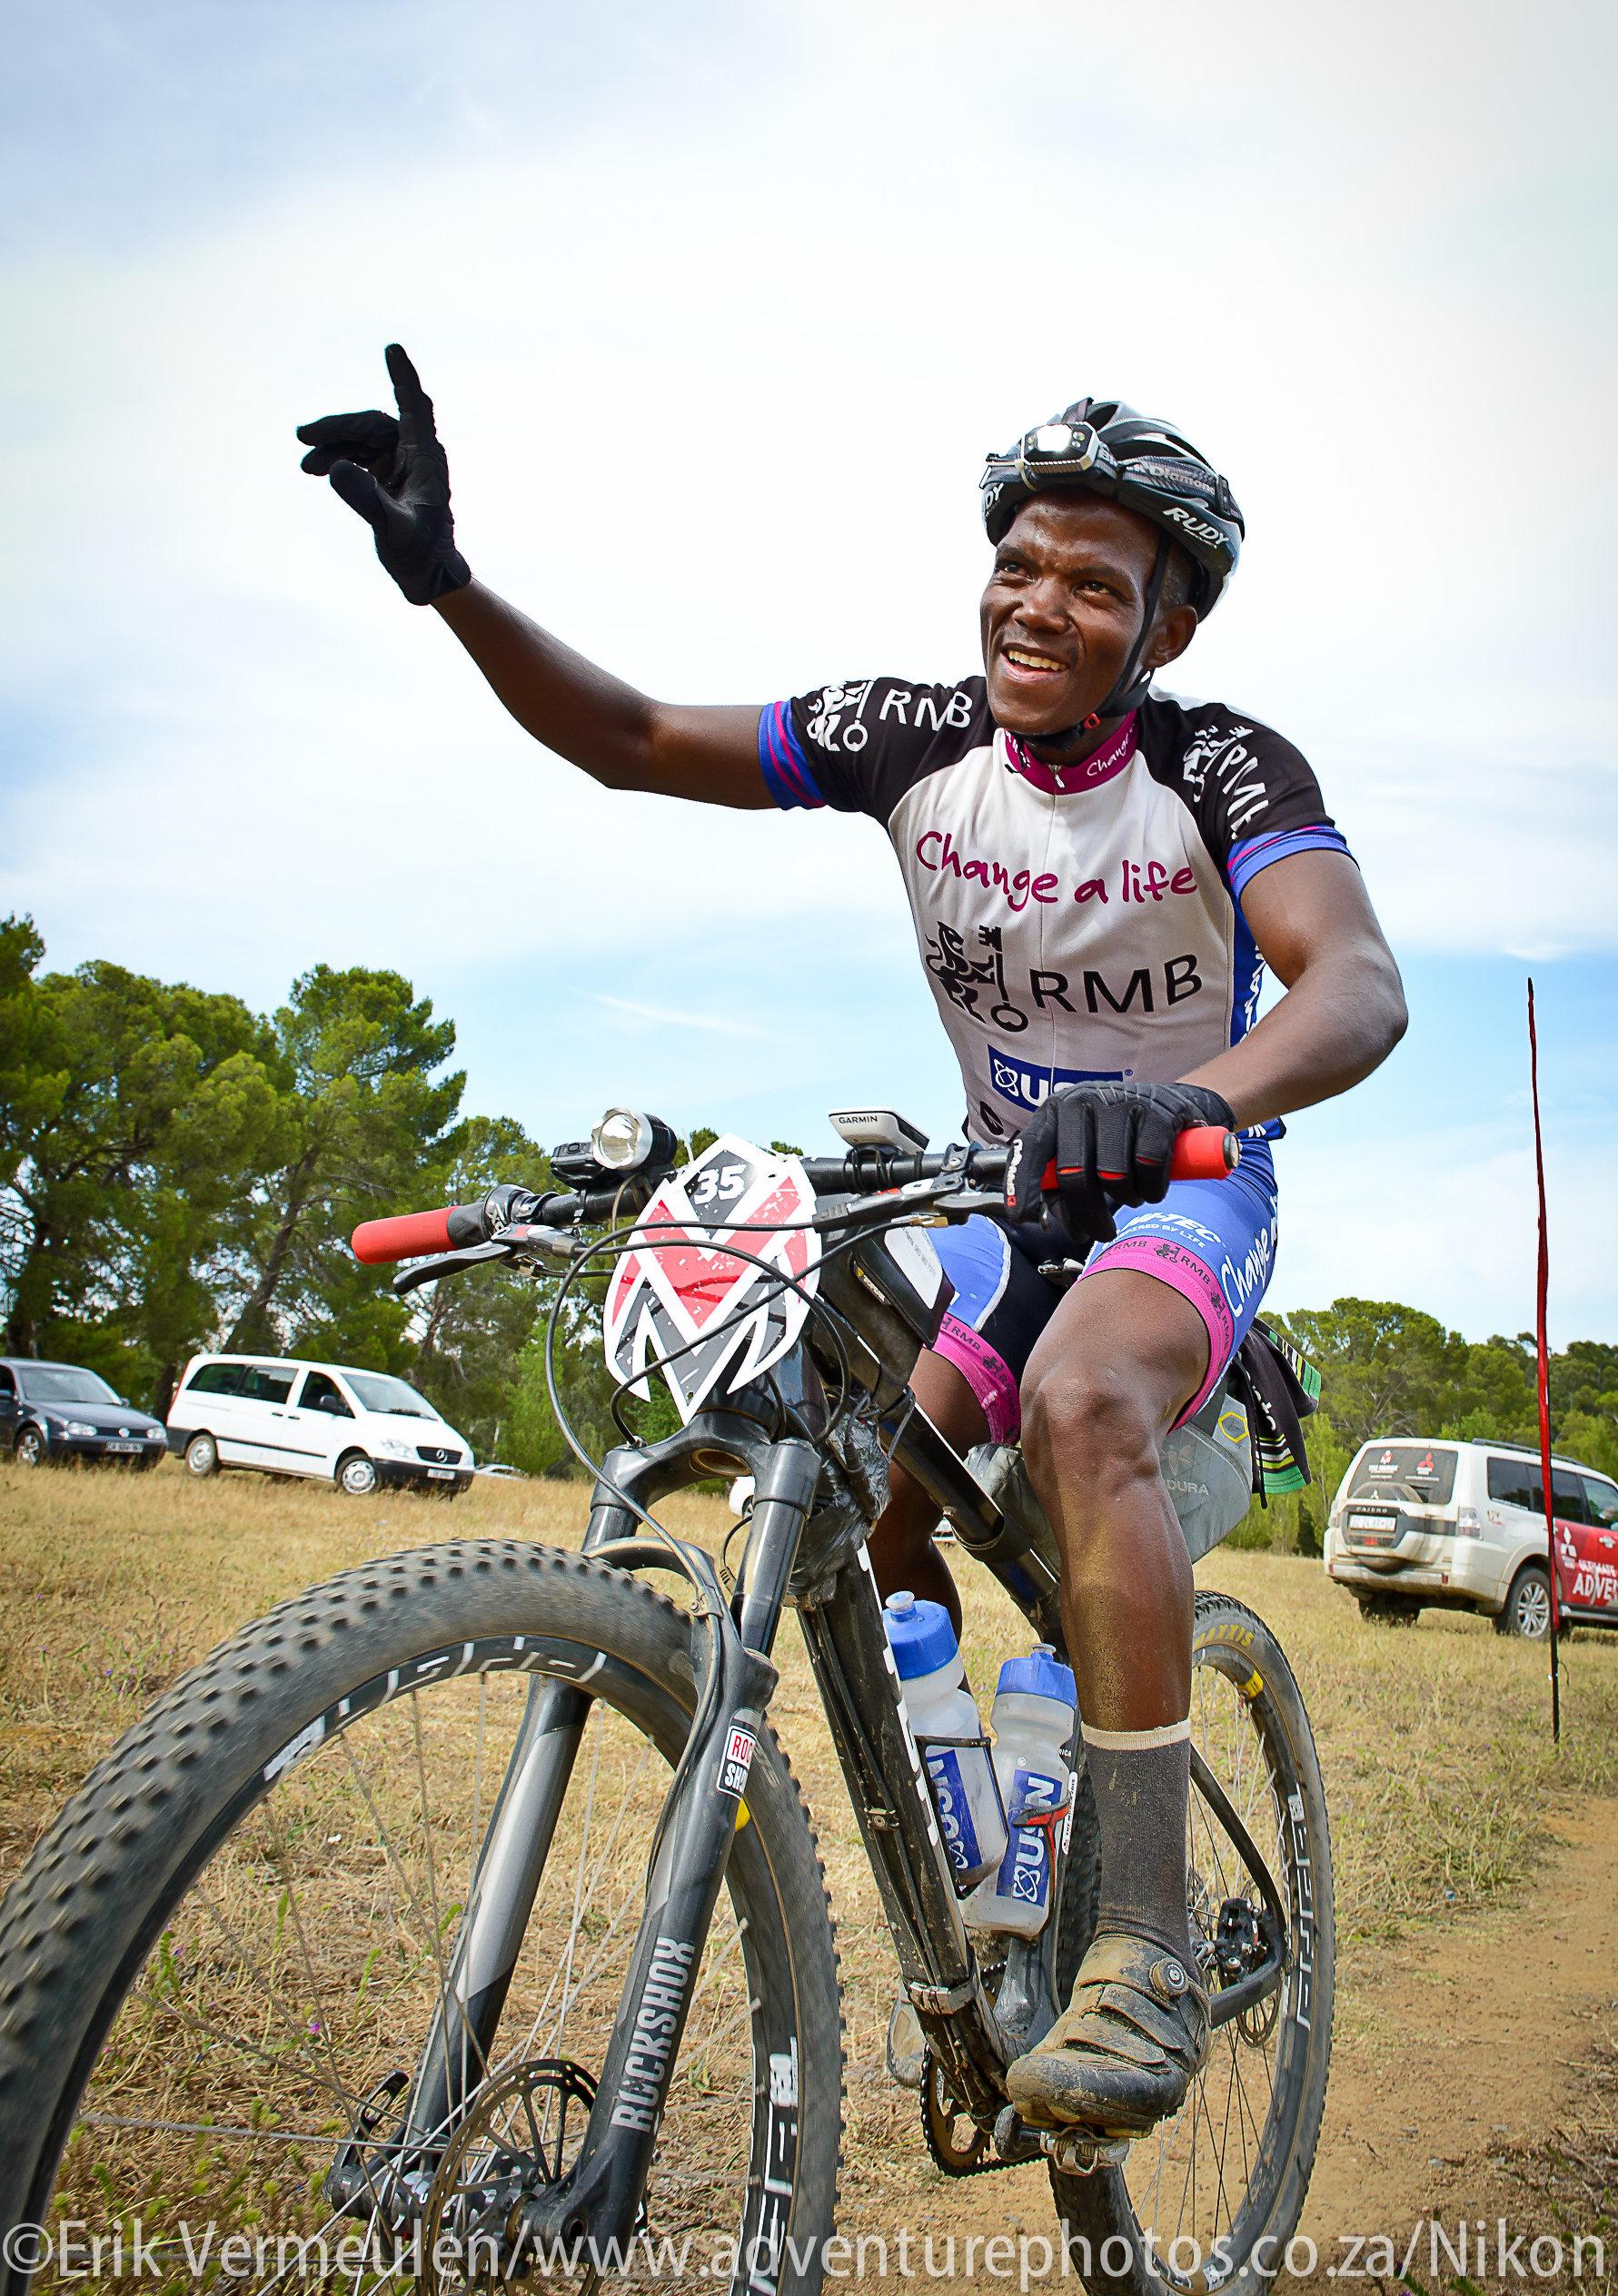 RMB Change a Life MTB Academy ace John Ntuli claimed a career defining win at the recent 1070km The Munga mountain bike race from Bloemfontein to Wellington. Erik Vermeulen